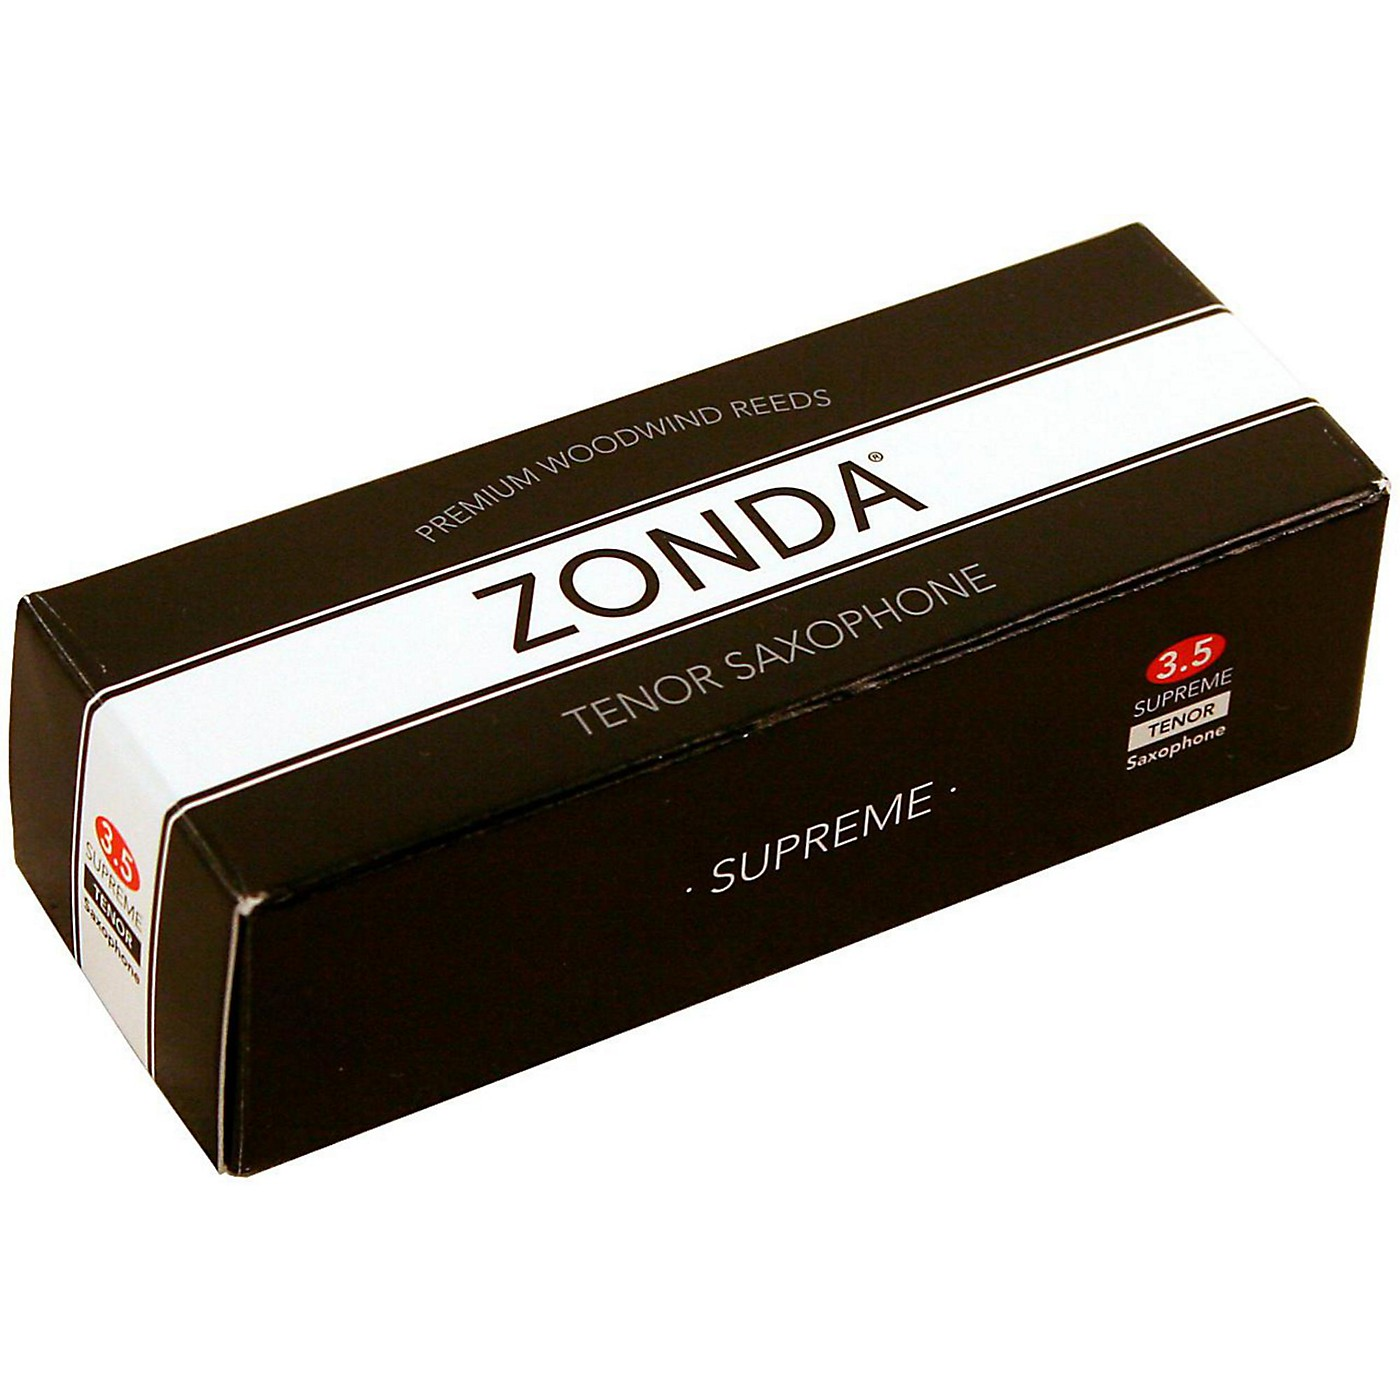 Zonda Supreme Tenor Saxophone Reed thumbnail